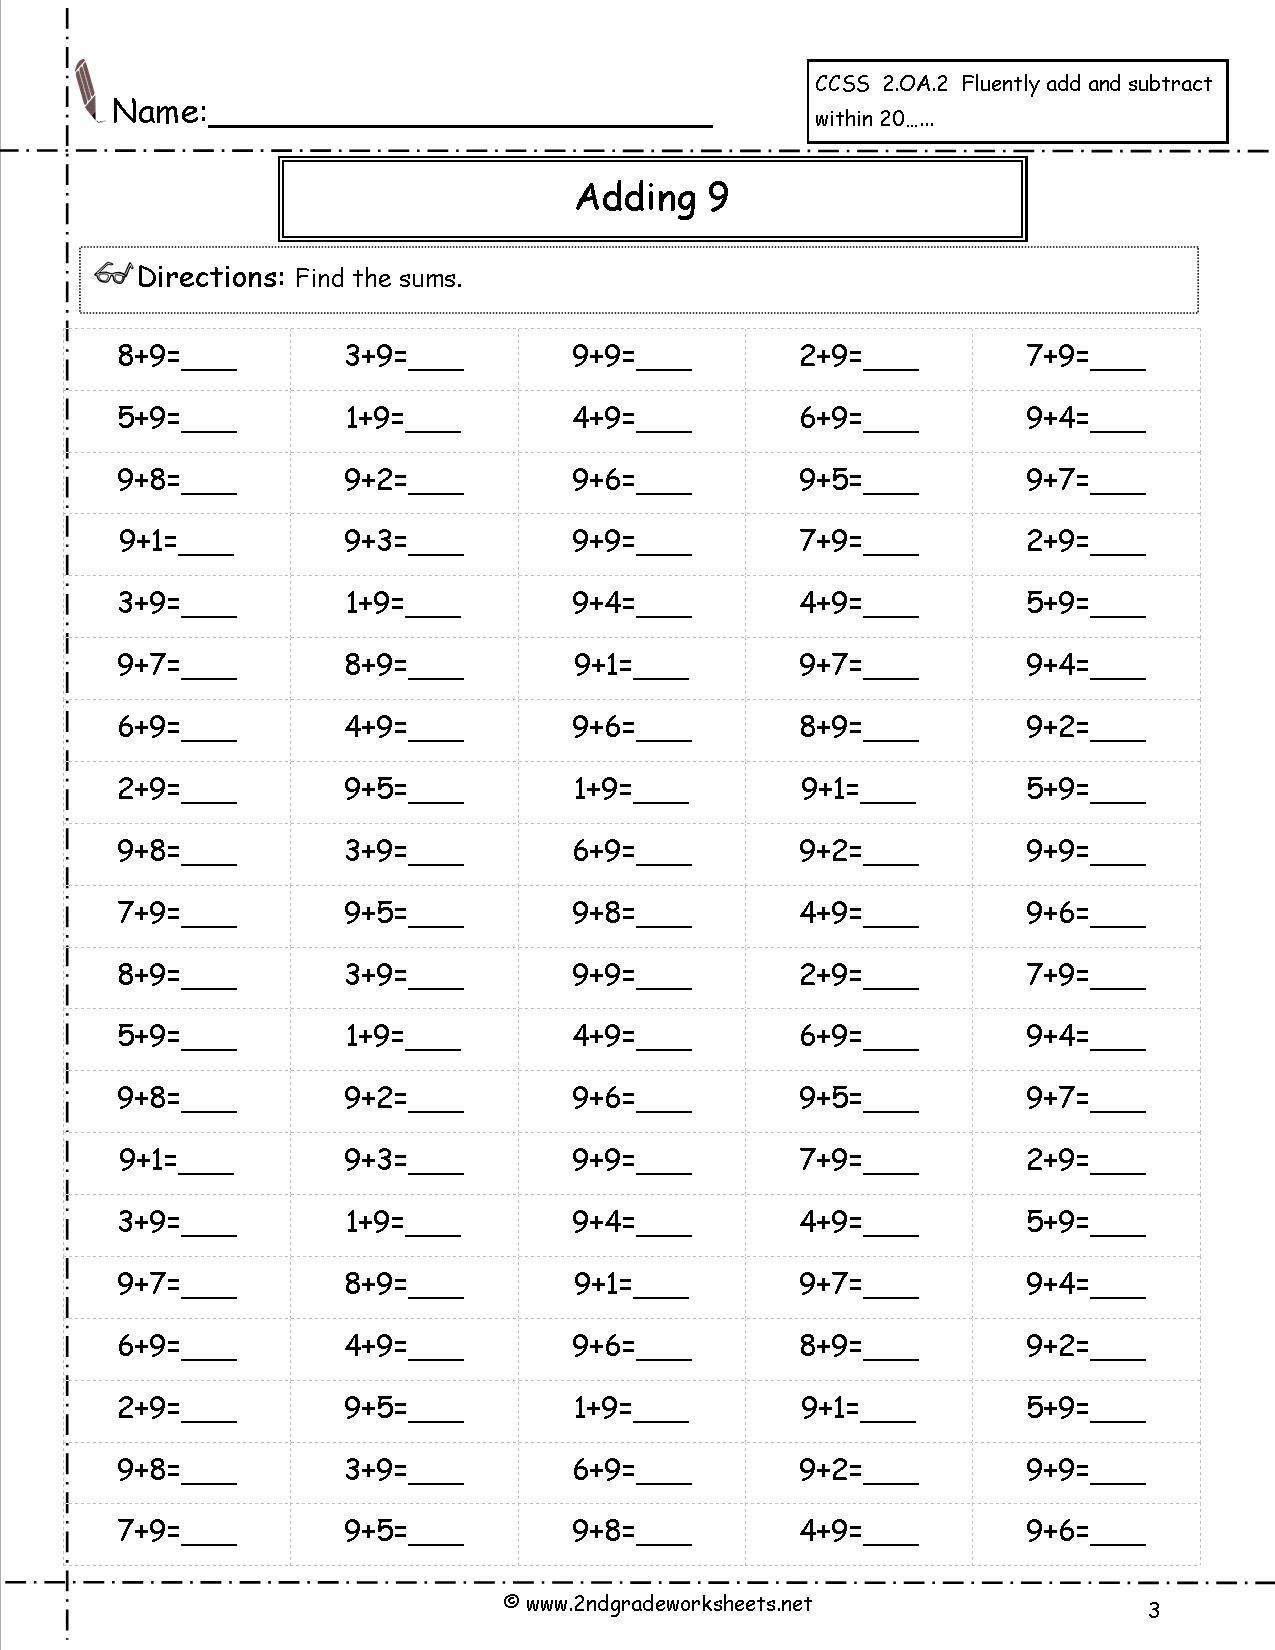 medium resolution of Adding 9 worksheet   1st grade math